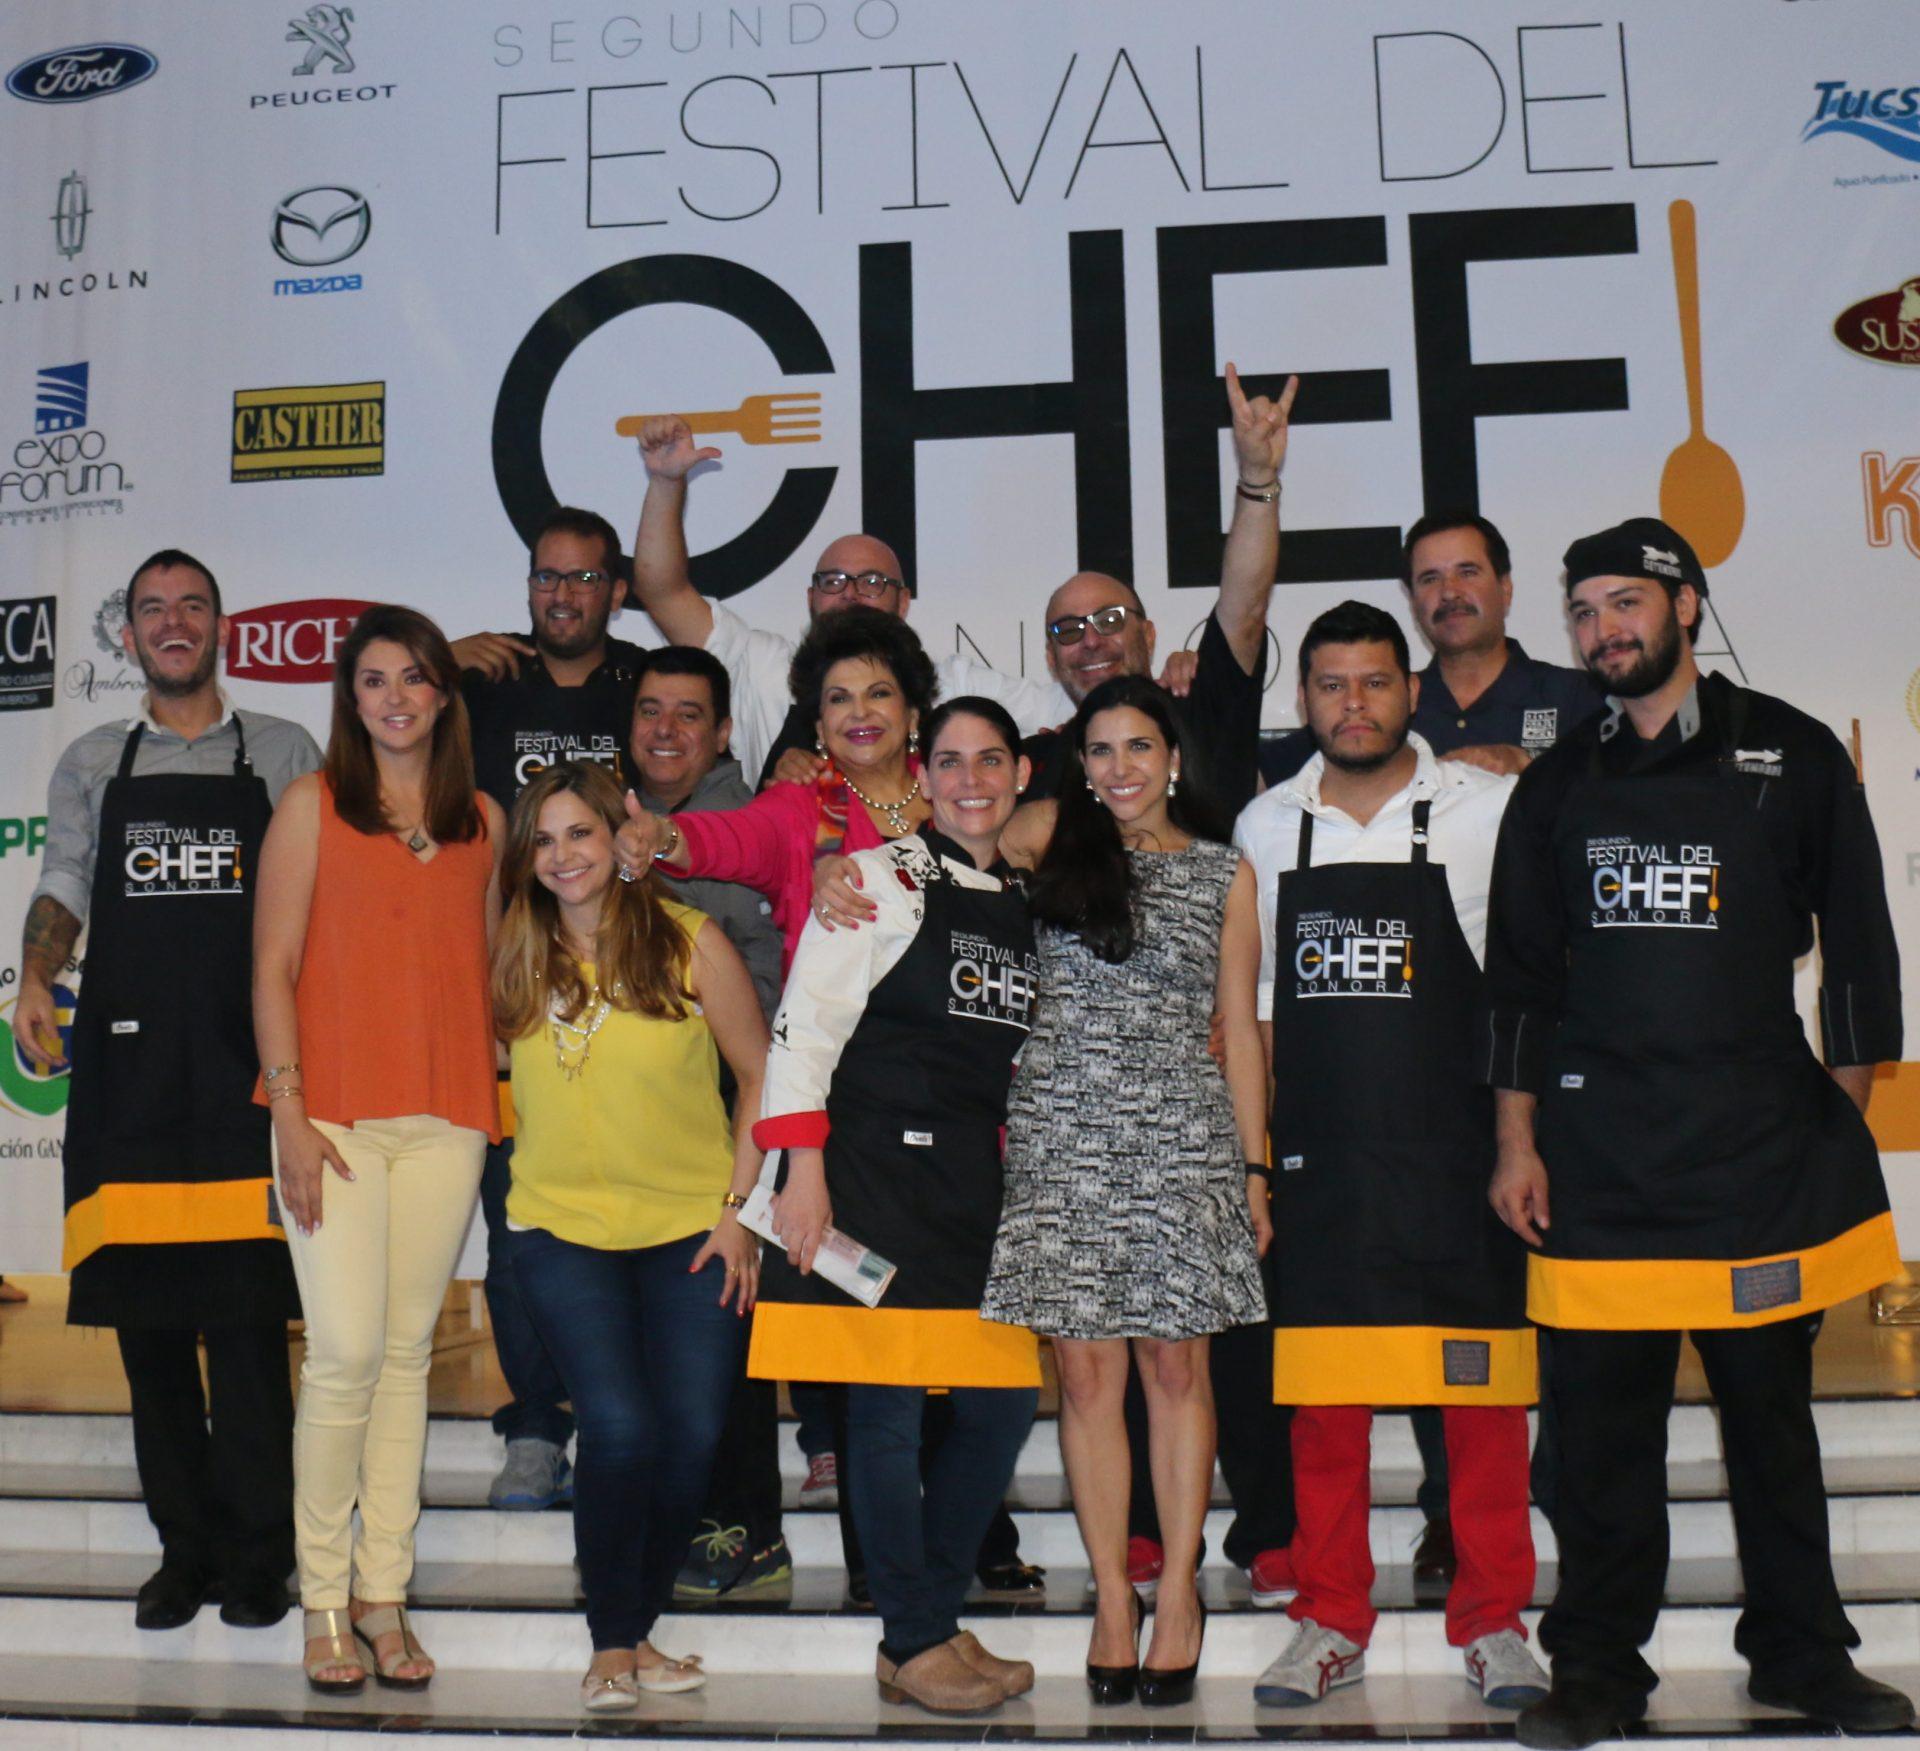 Festival del Chef Sonora impulsa gastronomía